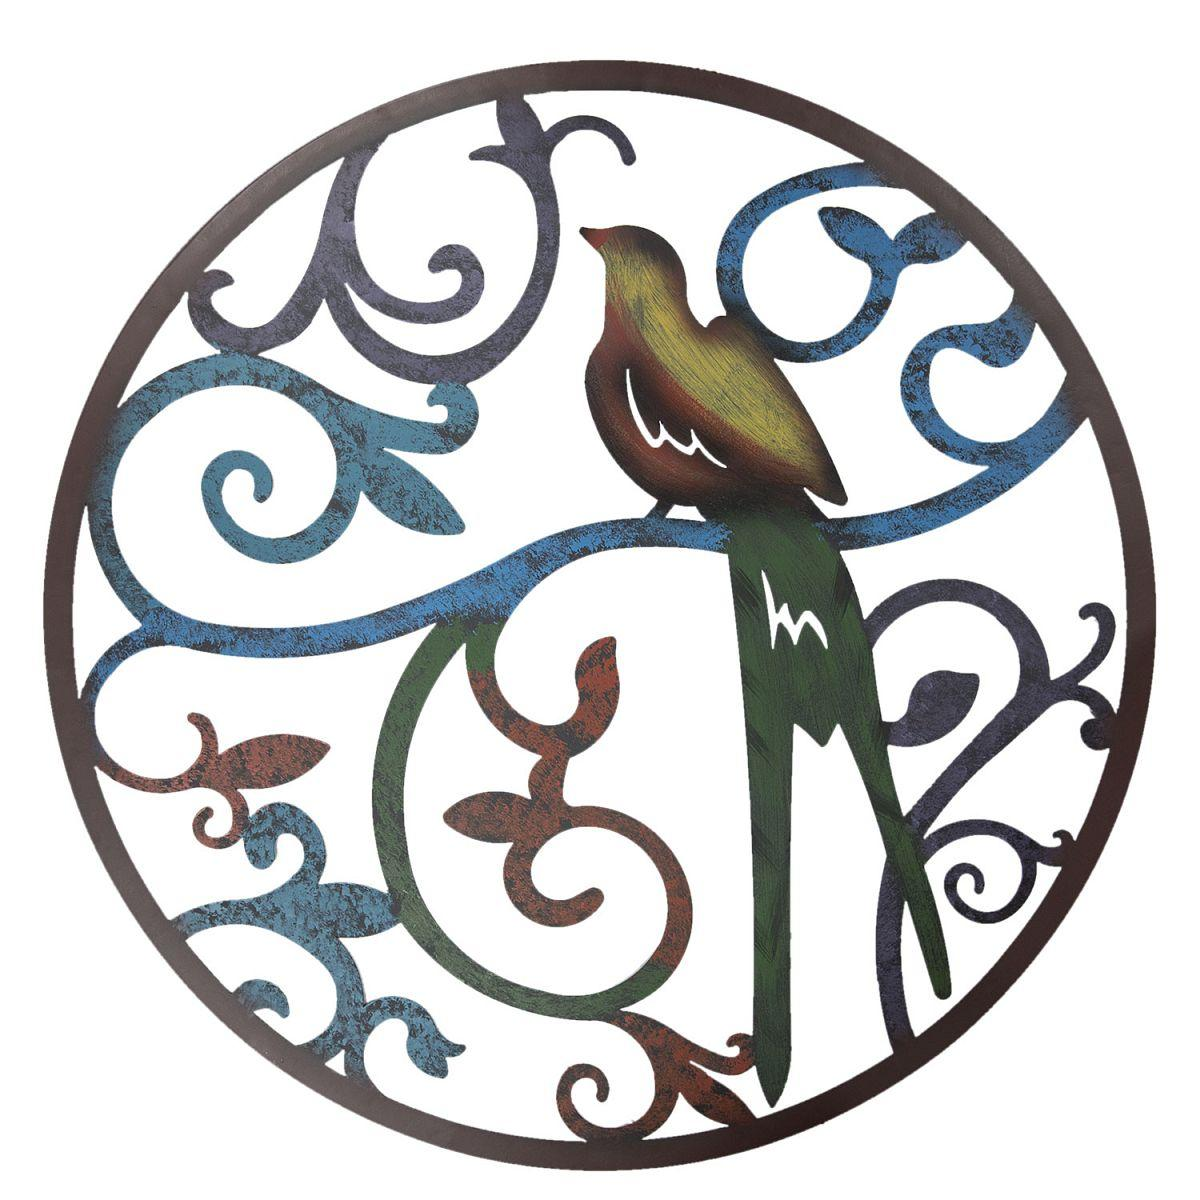 Nástěnná dekorace BIRD